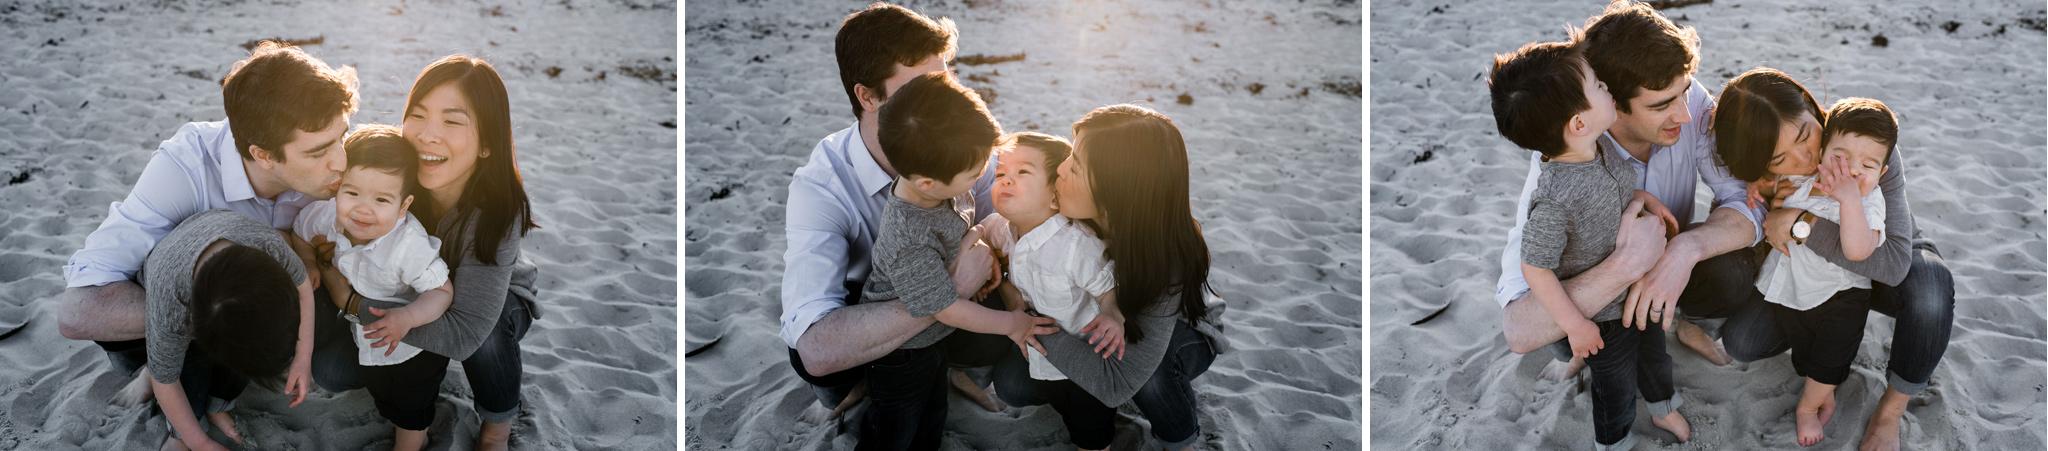 114-beach-family-session-documentary-halifax-toronto.jpg